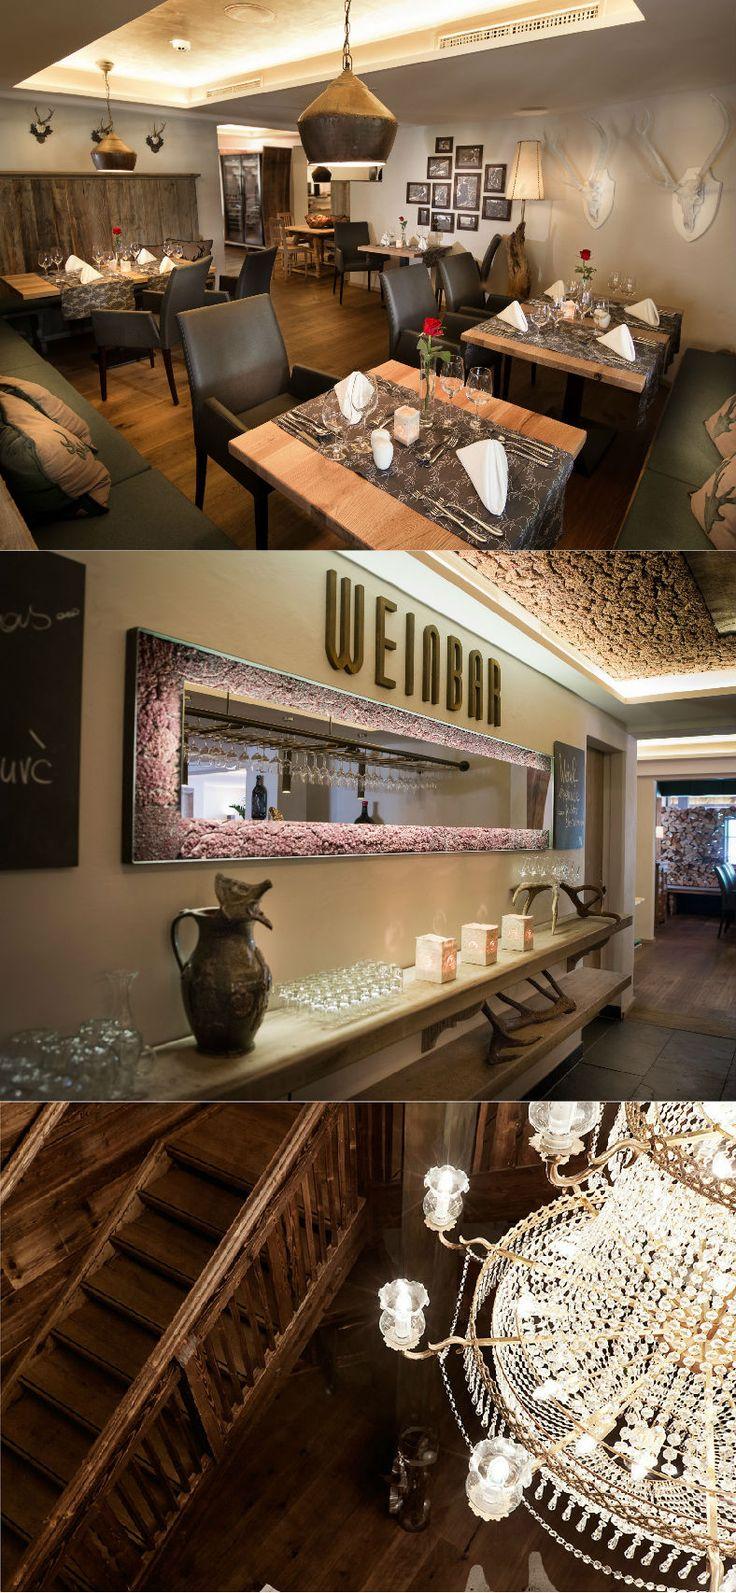 Alpin Juwel | Lifestyle Hotel | Saalbach Hinterglemm | Austria | http://lifestylehotels.net/en/alpin-juwel | restaurant, wood, chandelier, wine bar, mirror, dining area, stairs, stairwell, romantic